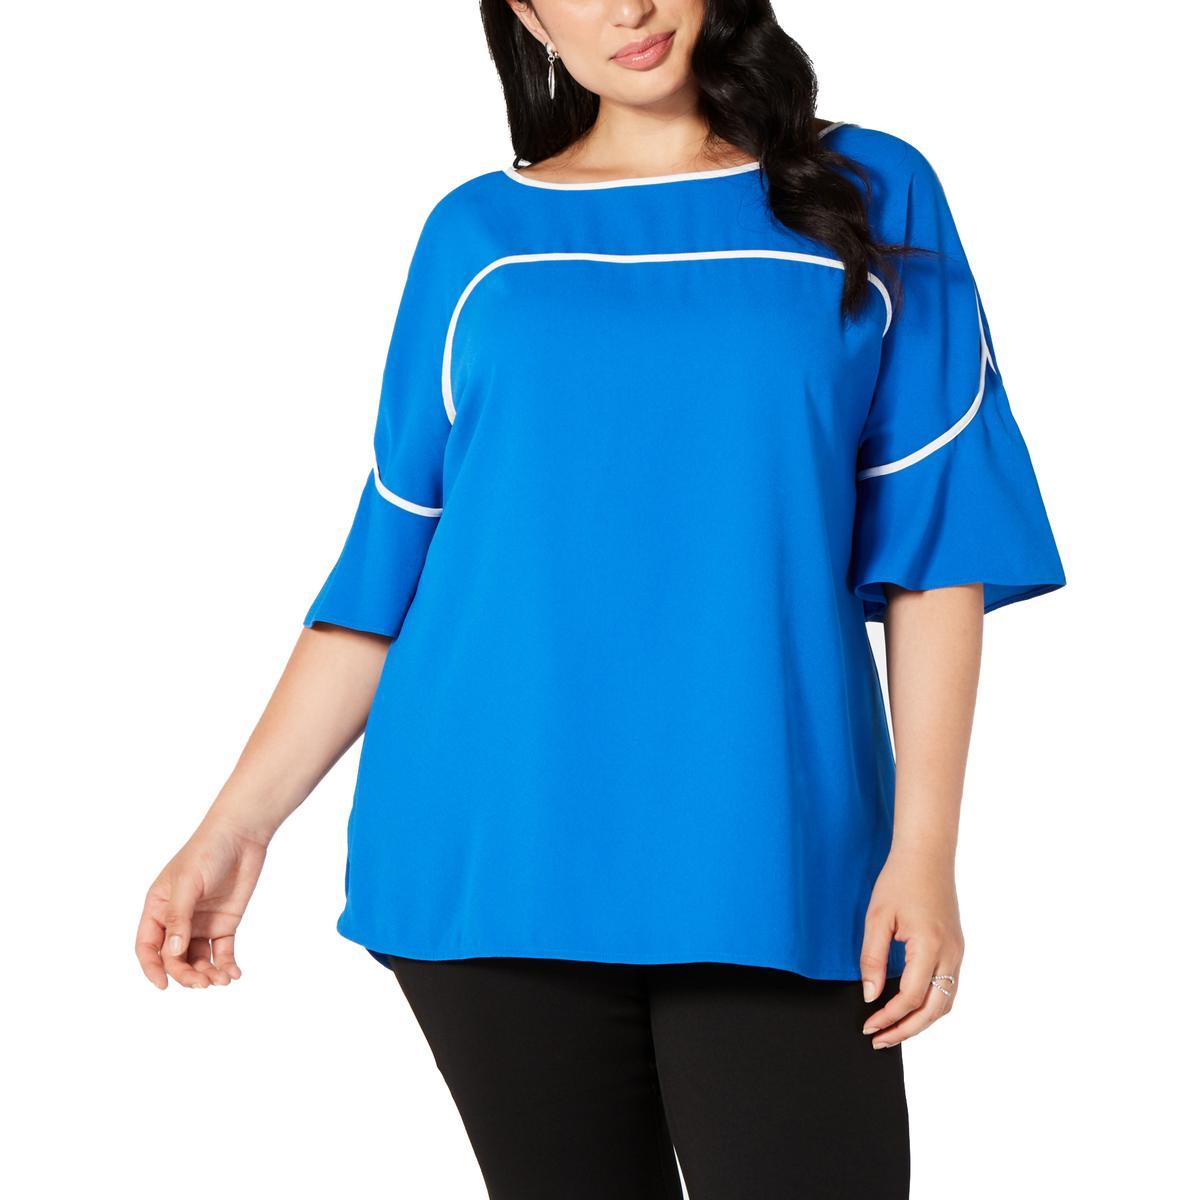 Alfani Womens Pink V-Neck Layered Tank Top Shirt Plus 3X BHFO 6184